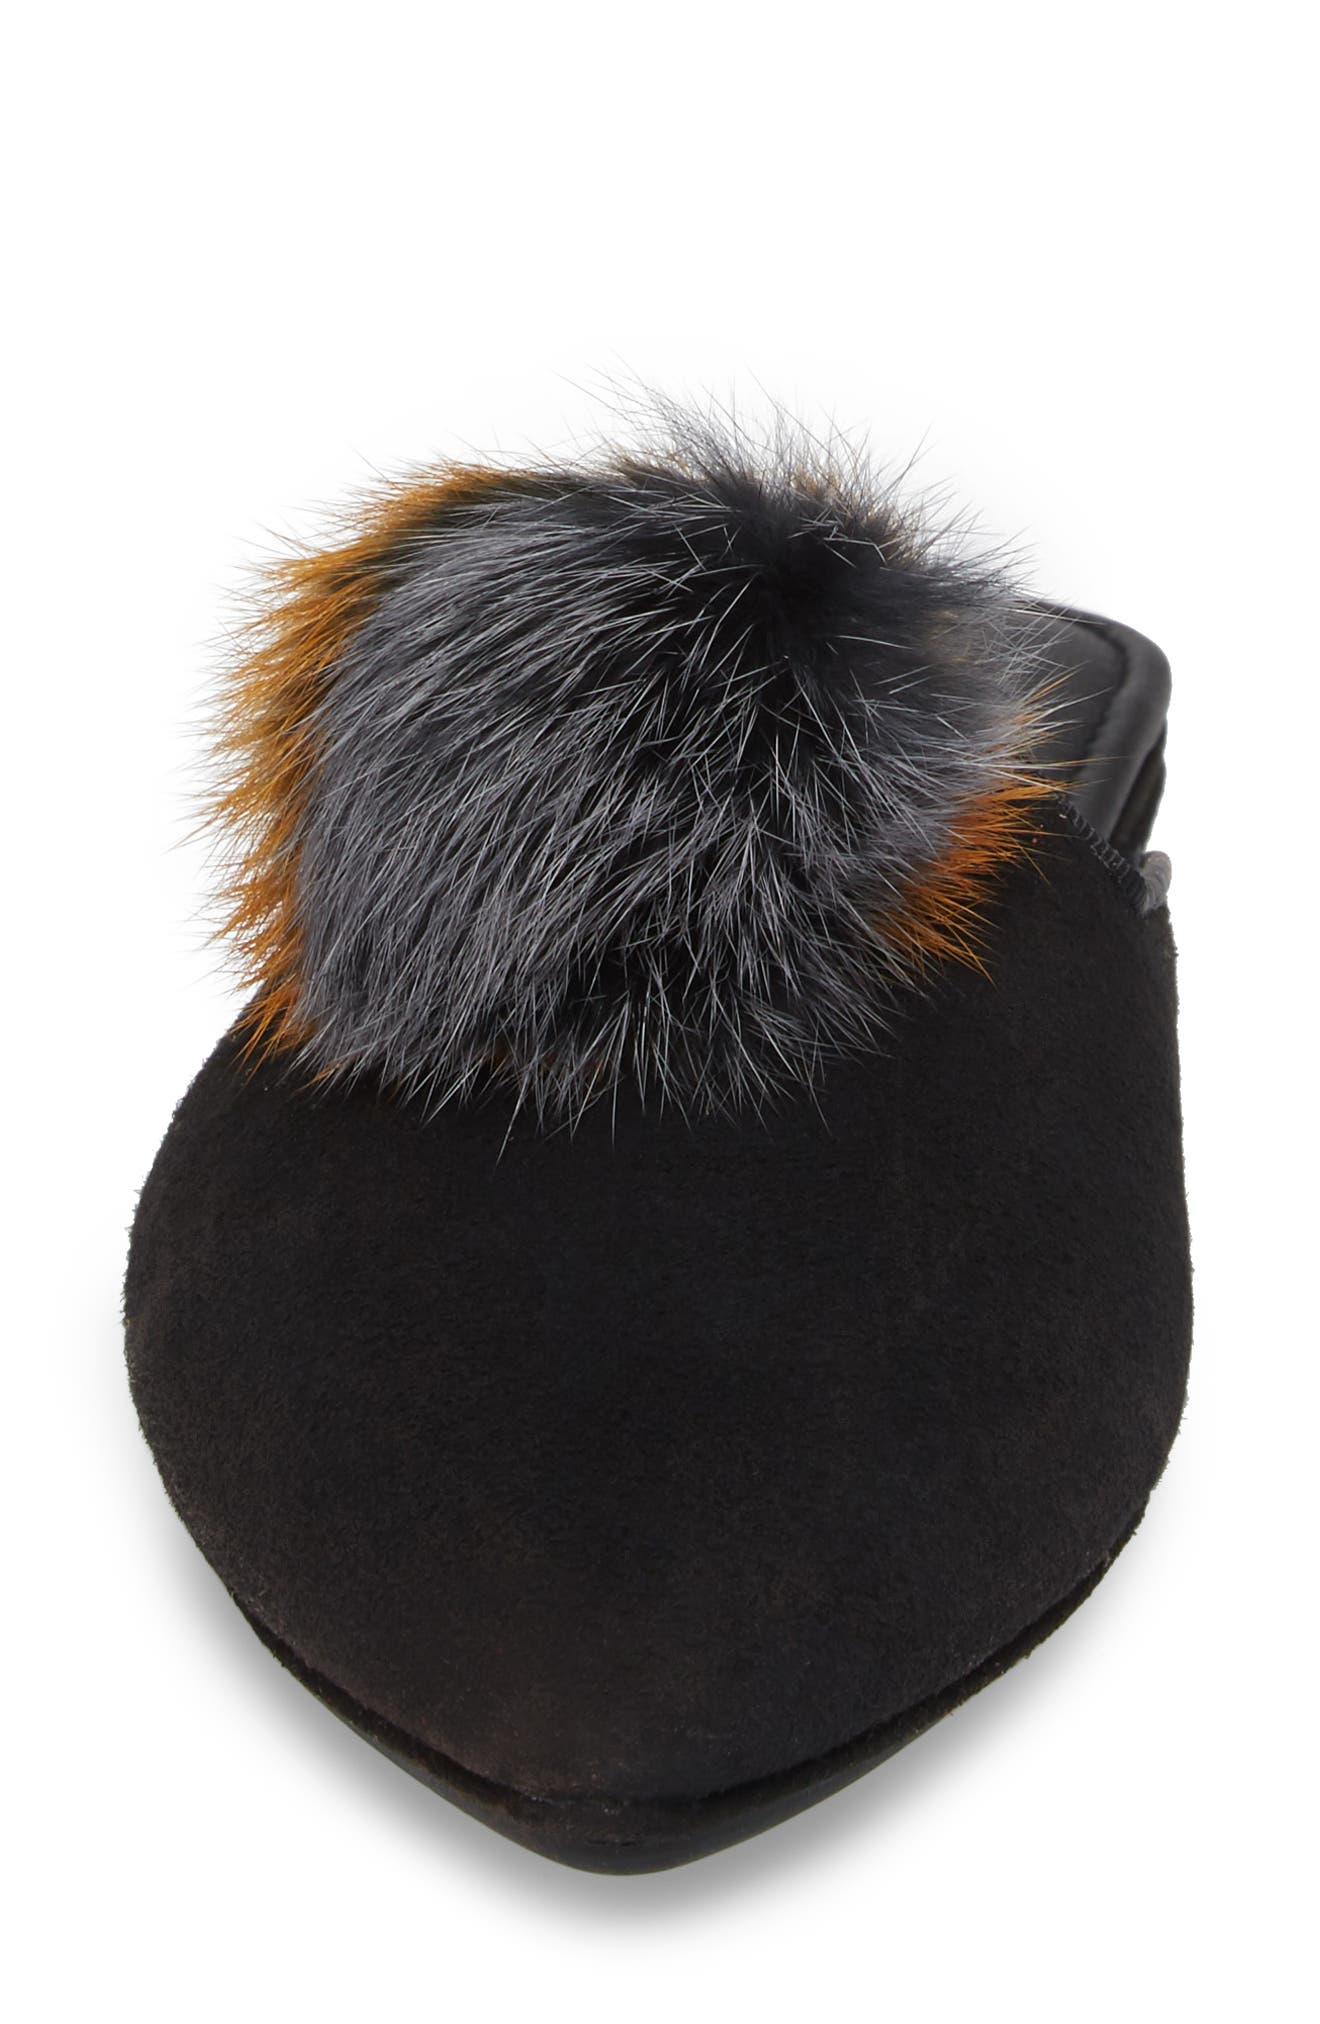 Vidi Genuine Rabbit Fur Loafer Mule,                             Alternate thumbnail 4, color,                             Black Rabbit Fur